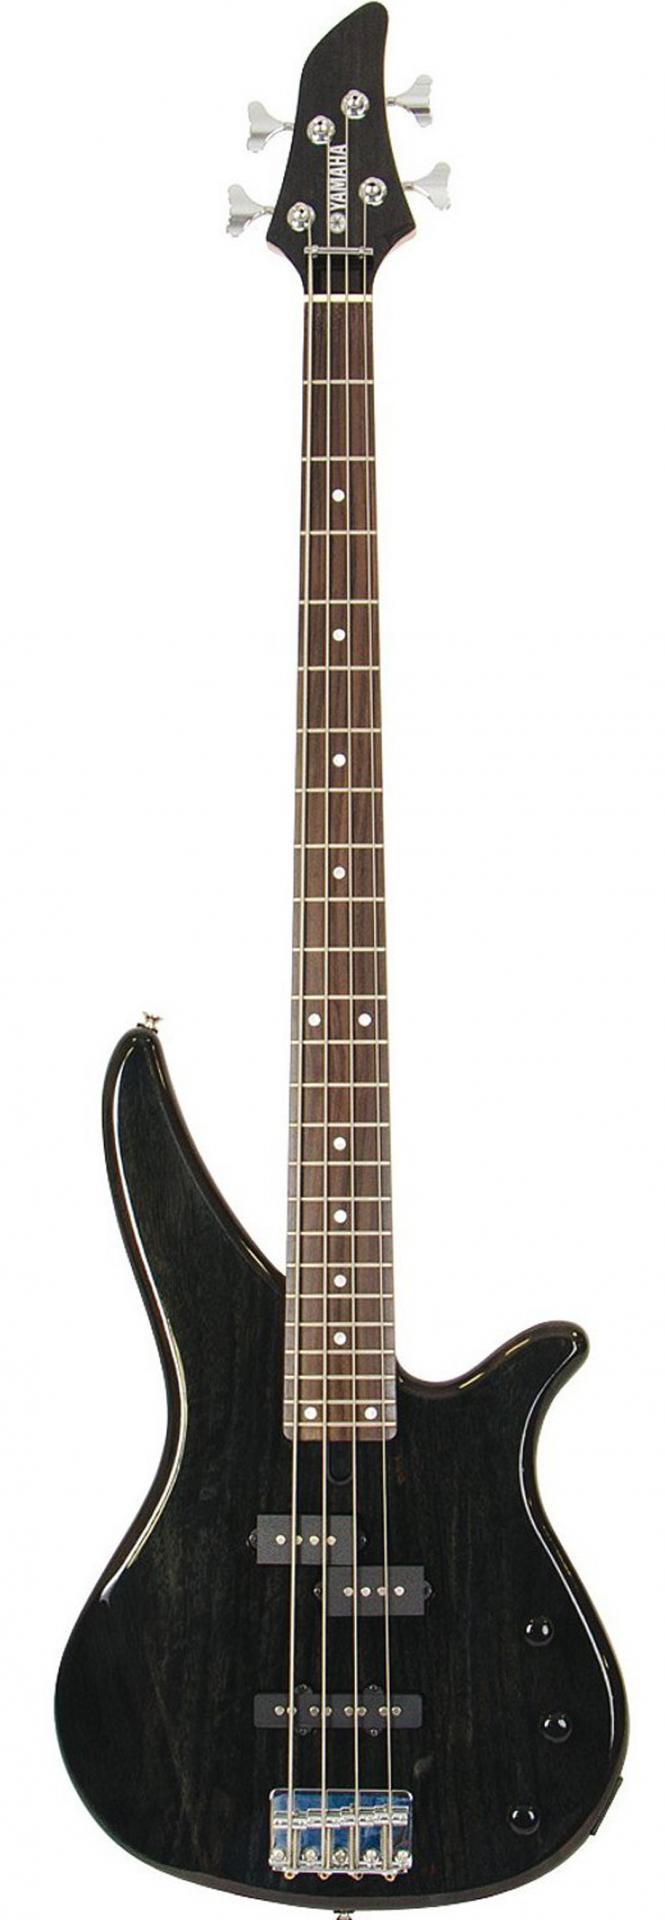 Yamaha rbx170ew tbl transulucent black